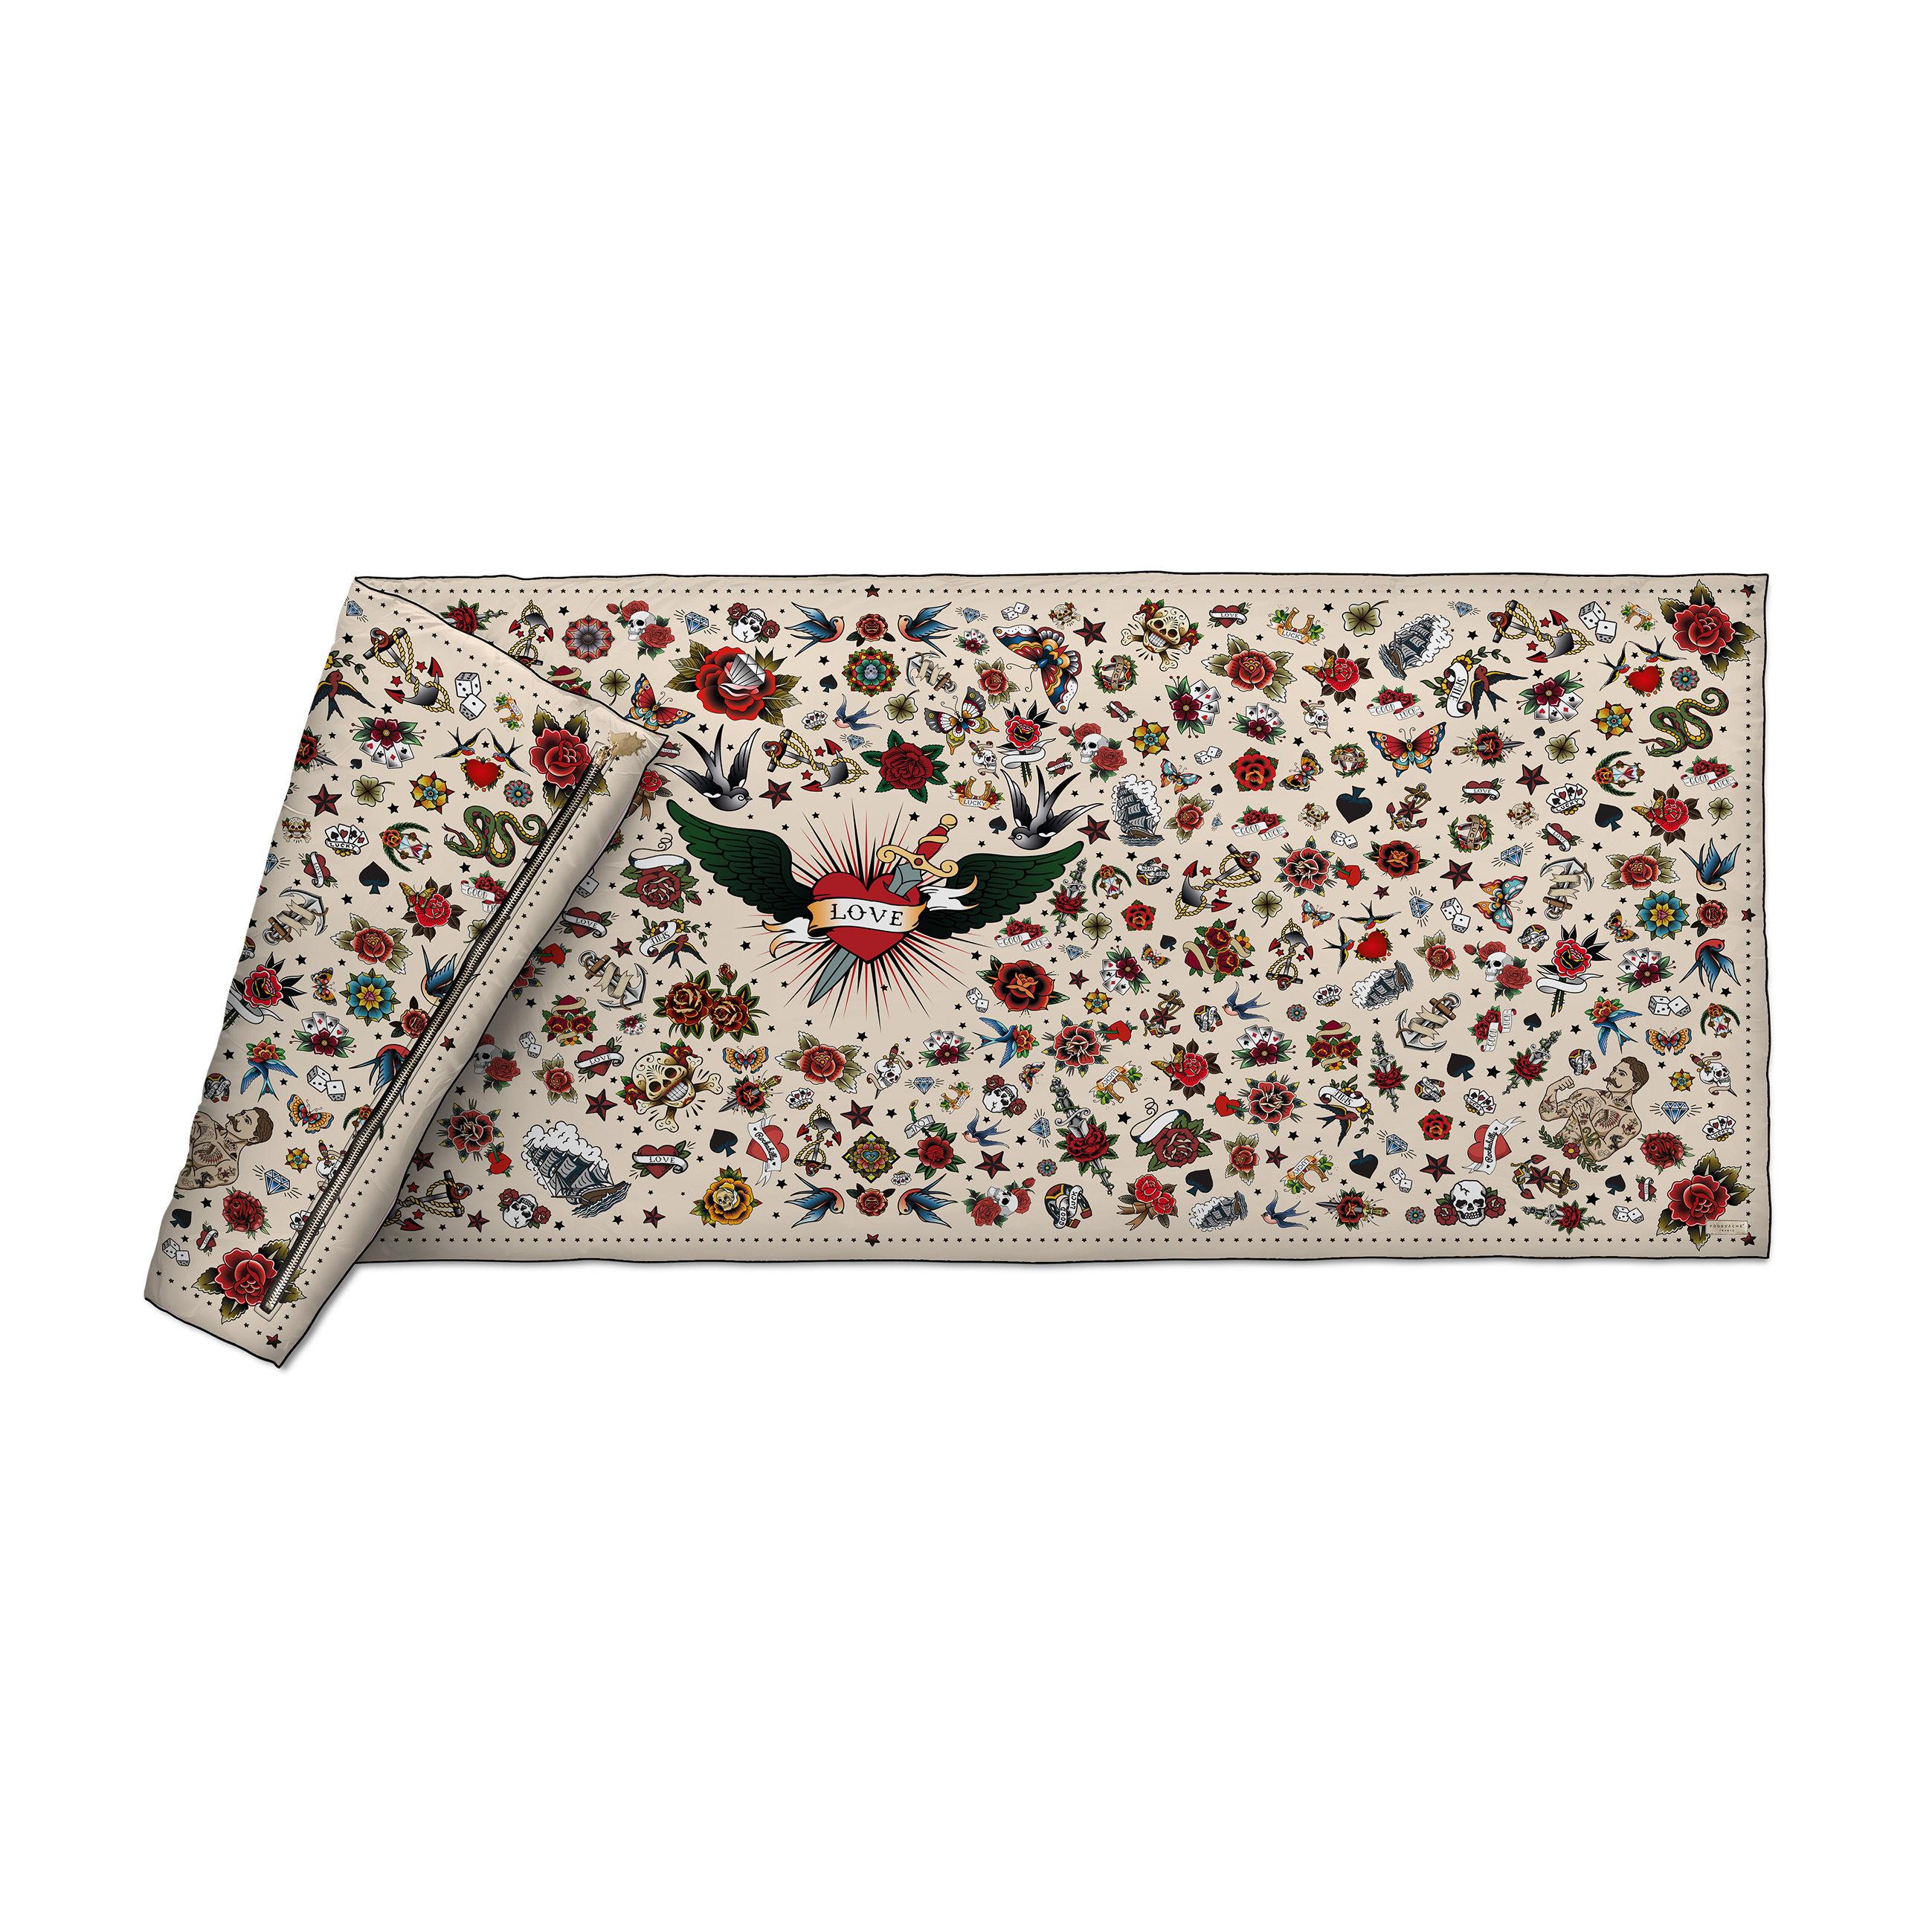 Decoration - Bedding & Bath Towels - Tatoo Plaid - / Velvet - 85 x 200 cm by PÔDEVACHE - Love Tattoo / Beige - Fabric, Polyester, Velvet